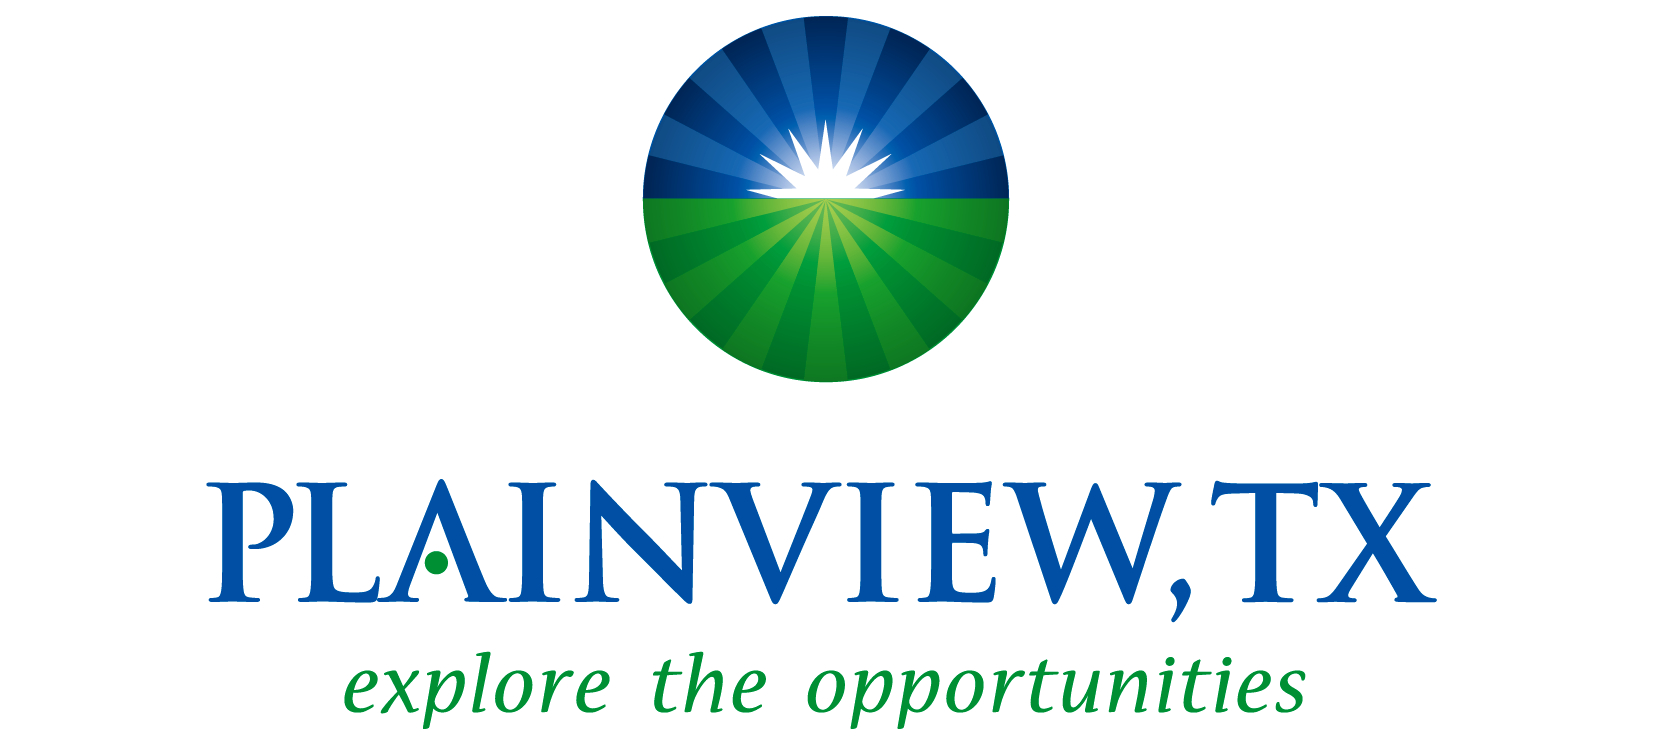 Plainview logo CLR stack